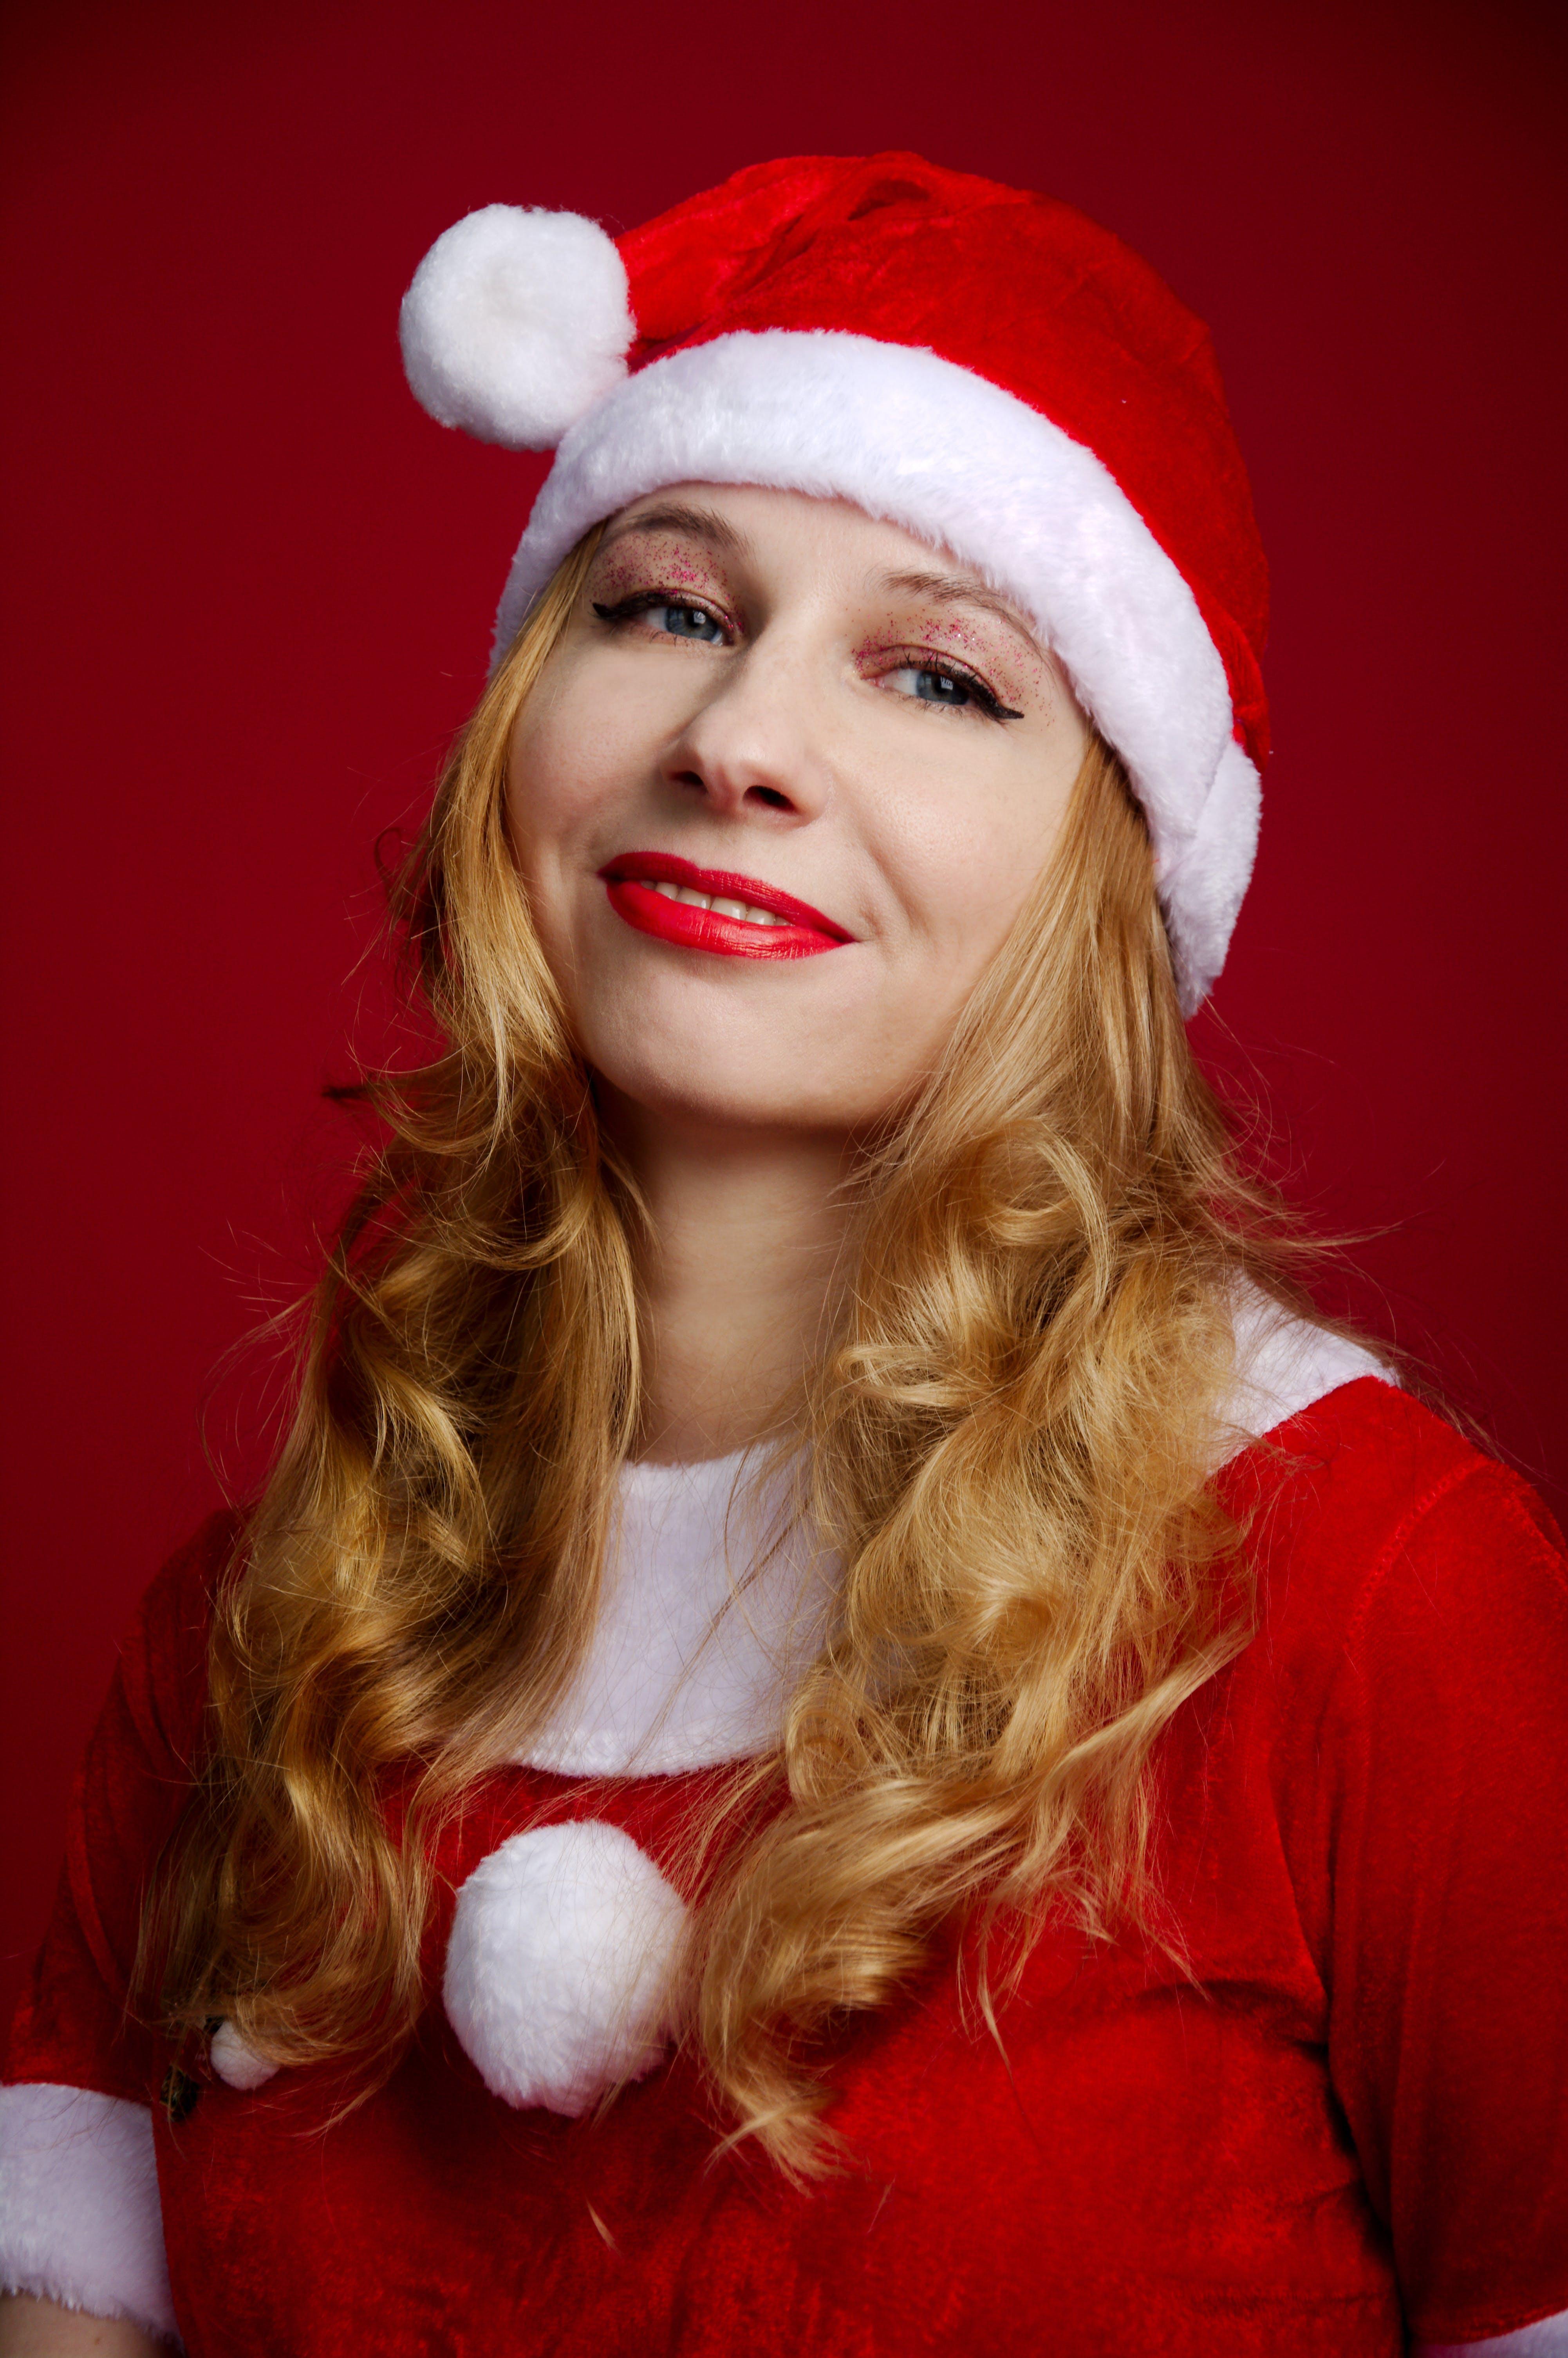 Foto profissional grátis de ano novo, fantasia de papai noel, feliz ano novo, Papai Noel